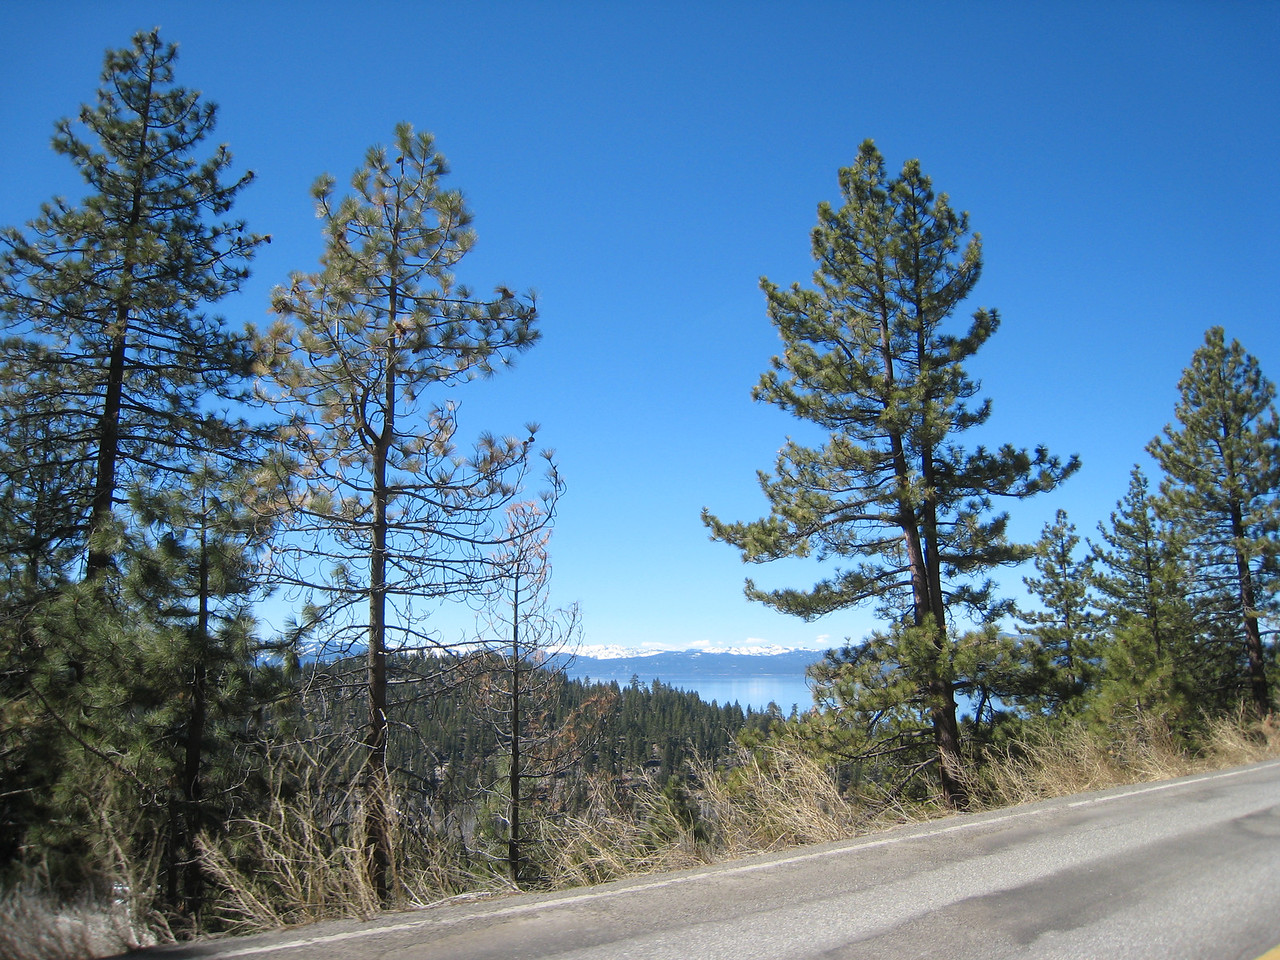 Lake Tahoe begins to peek through the trees and hills...